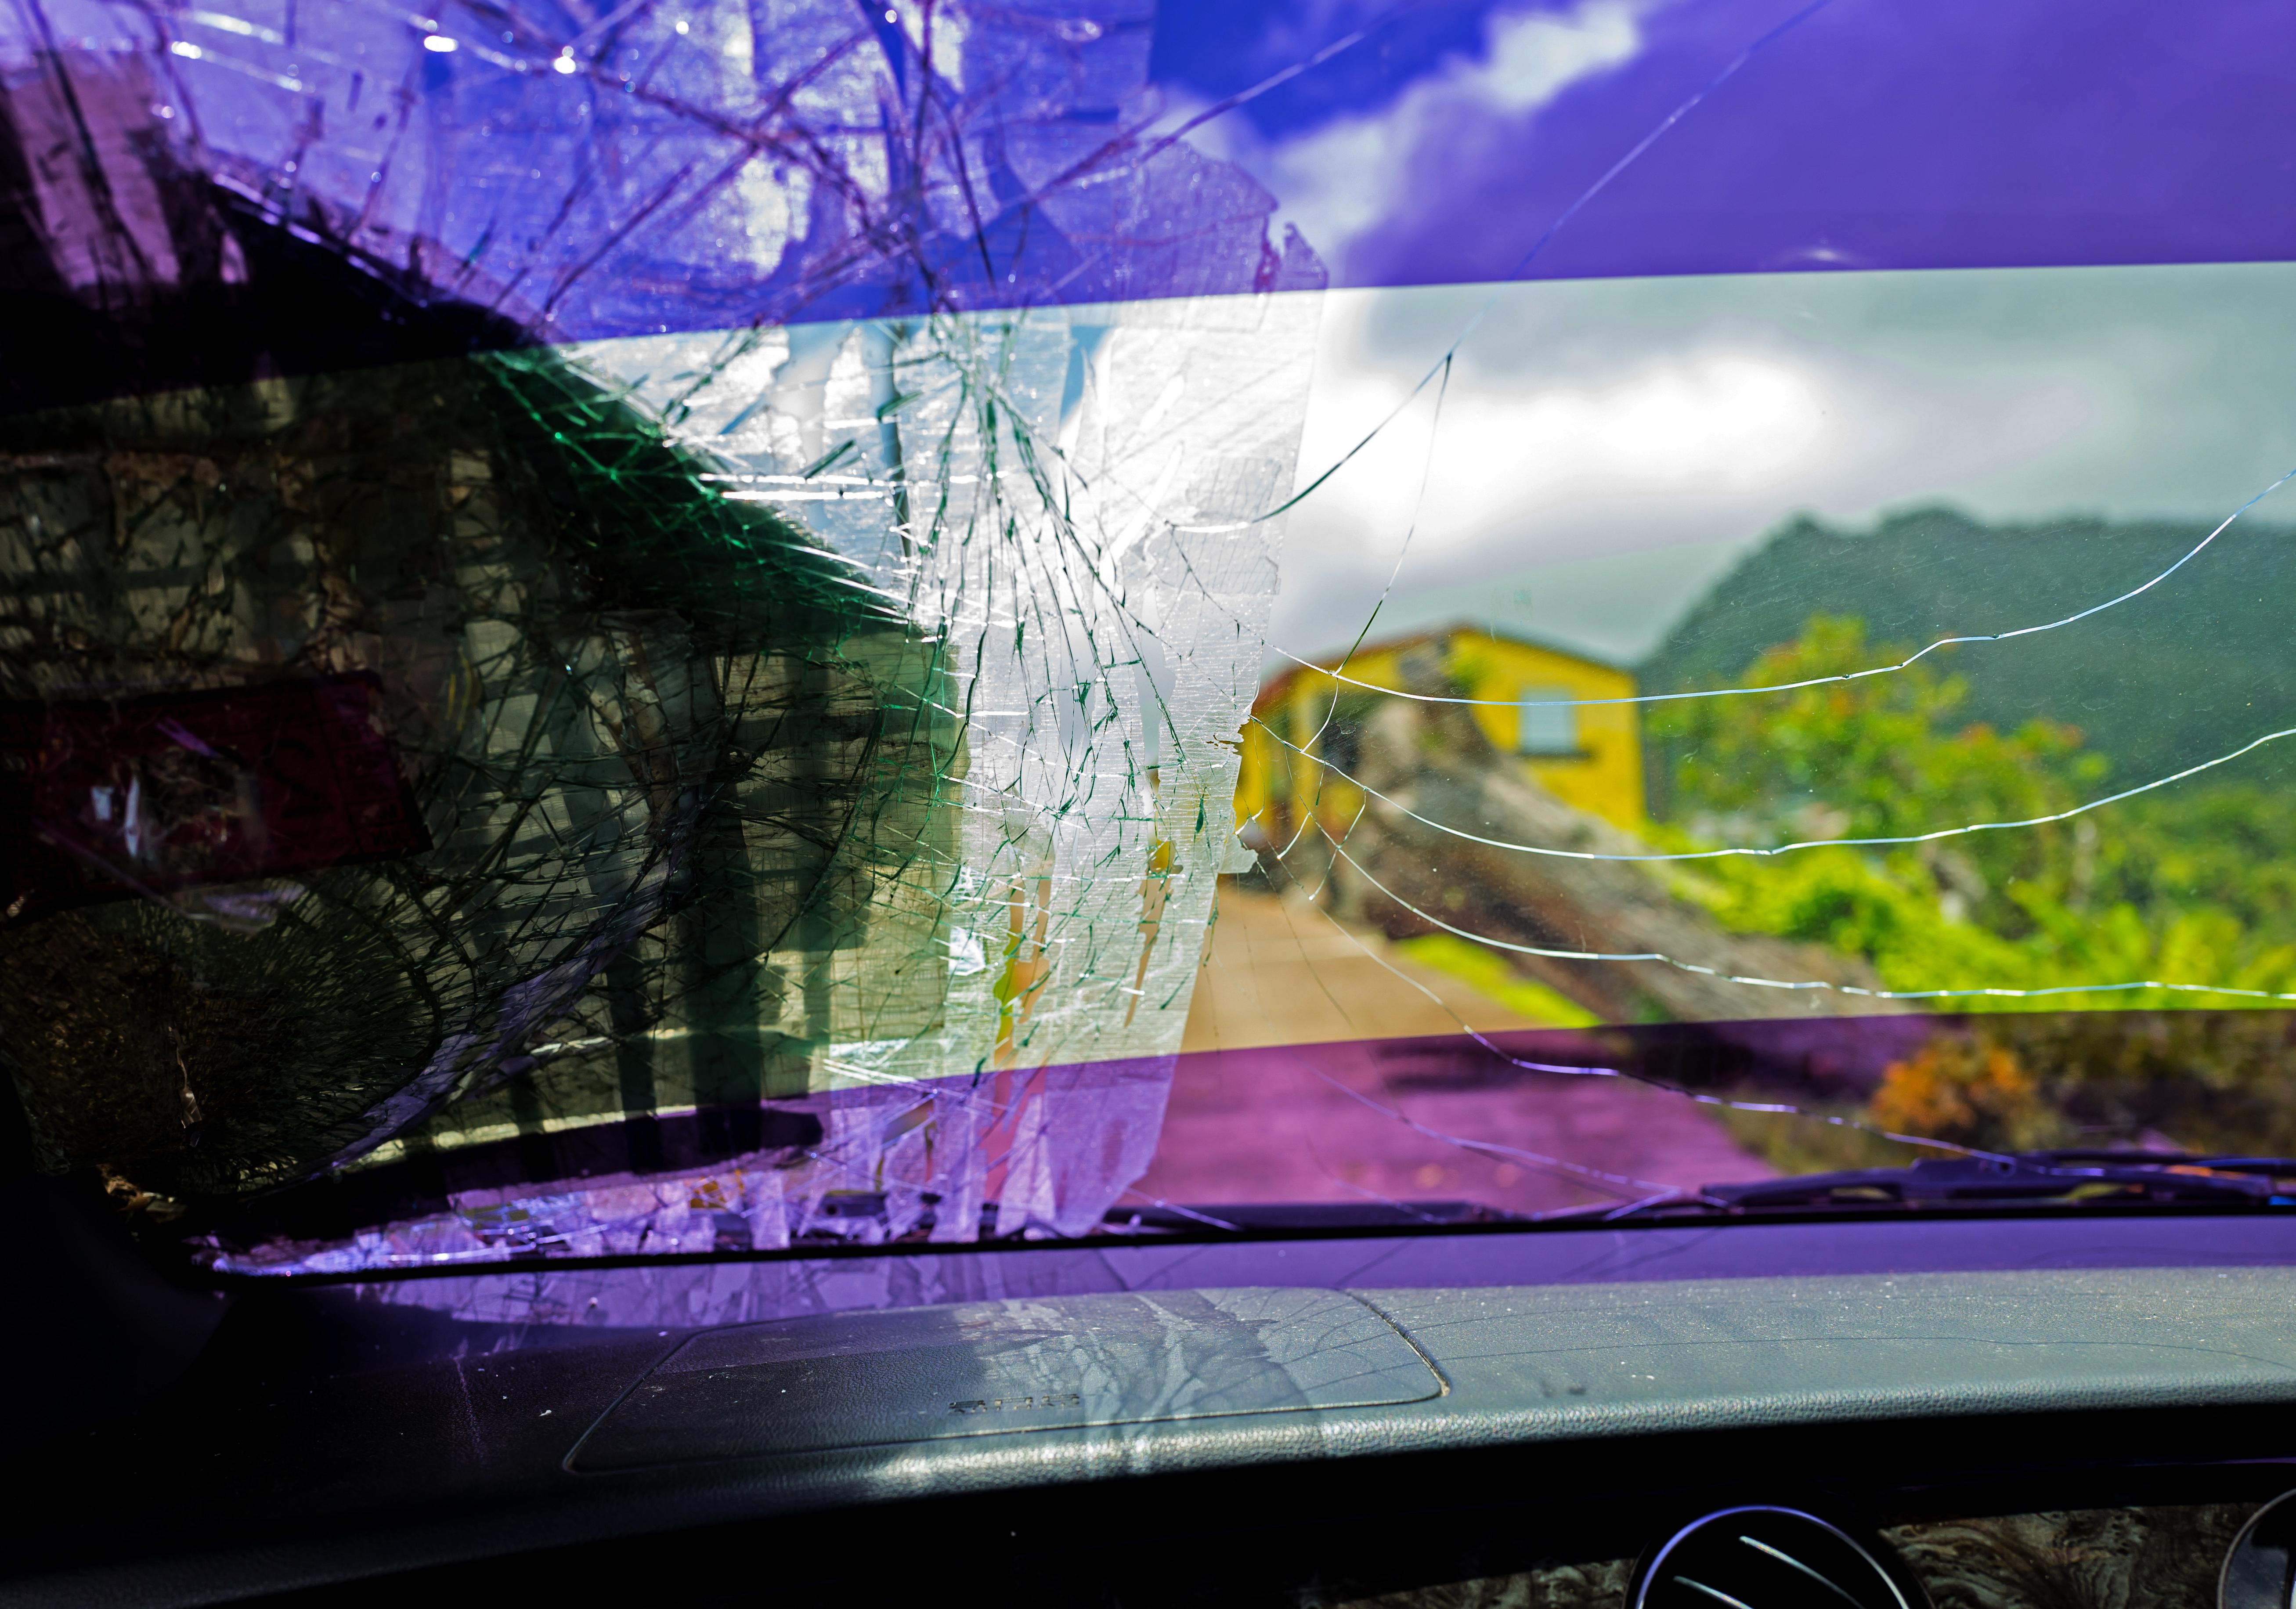 windshield-1526753561-13.jpg